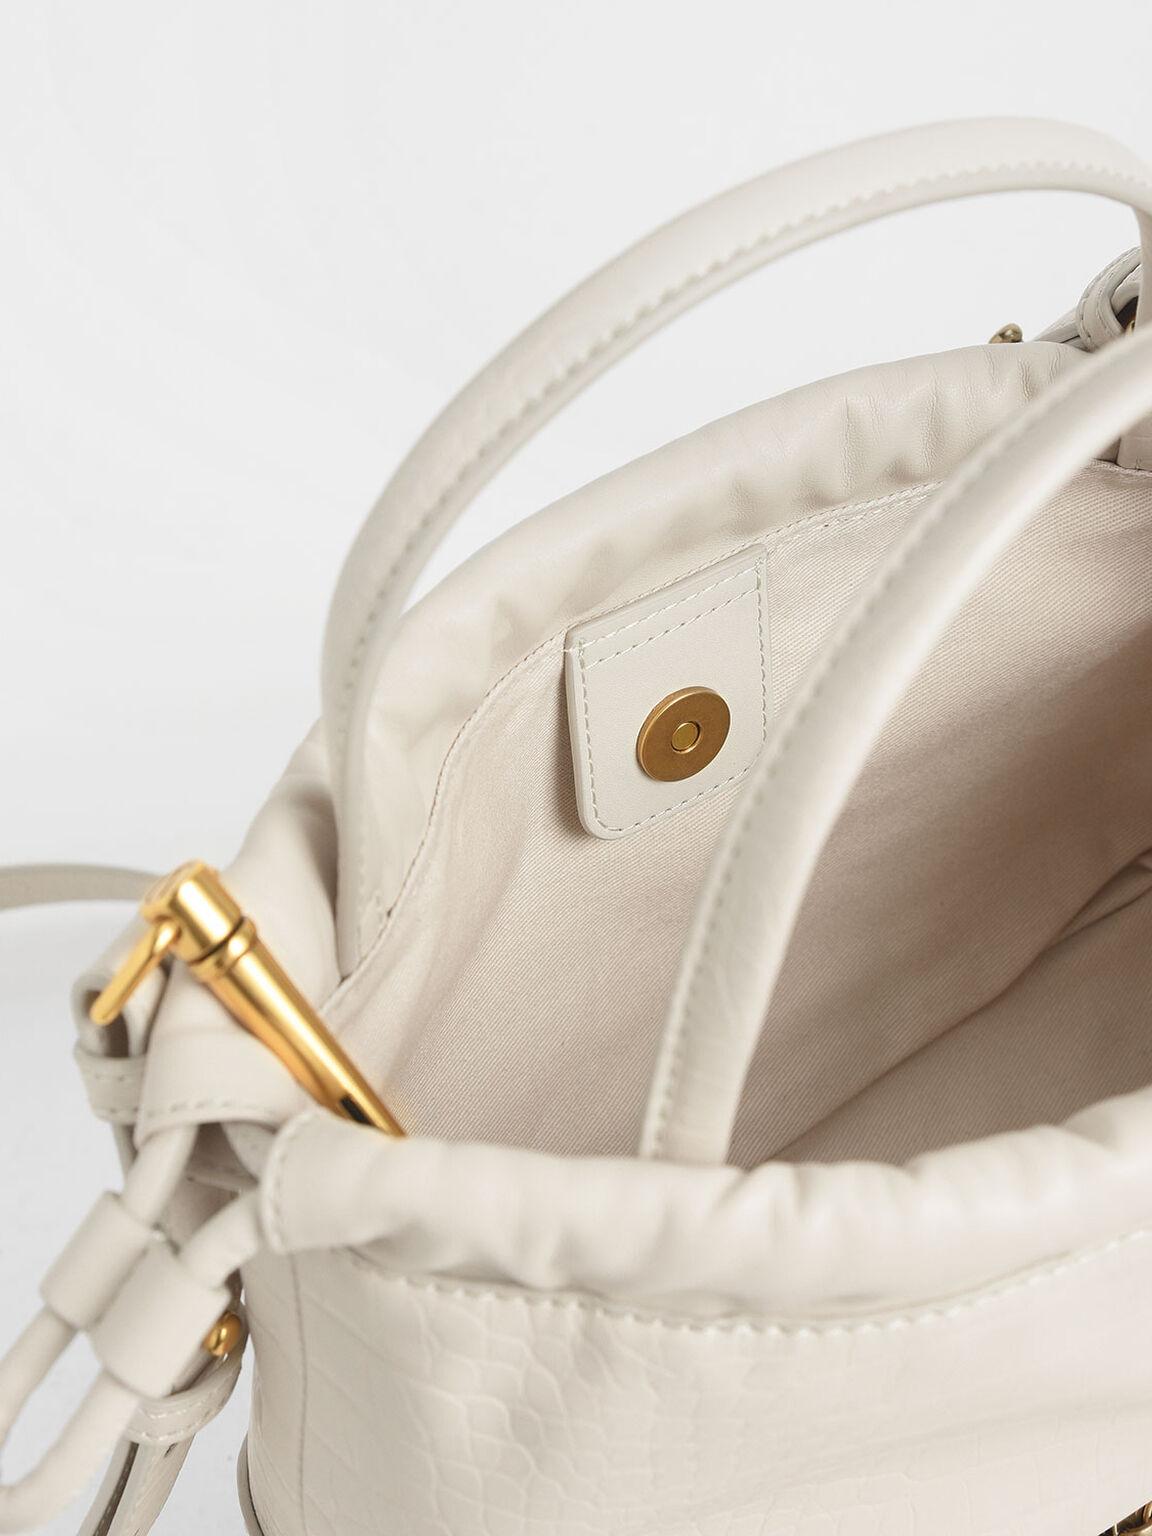 Croc-Effect Two-Way Zip Drawstring Bag, Cream, hi-res